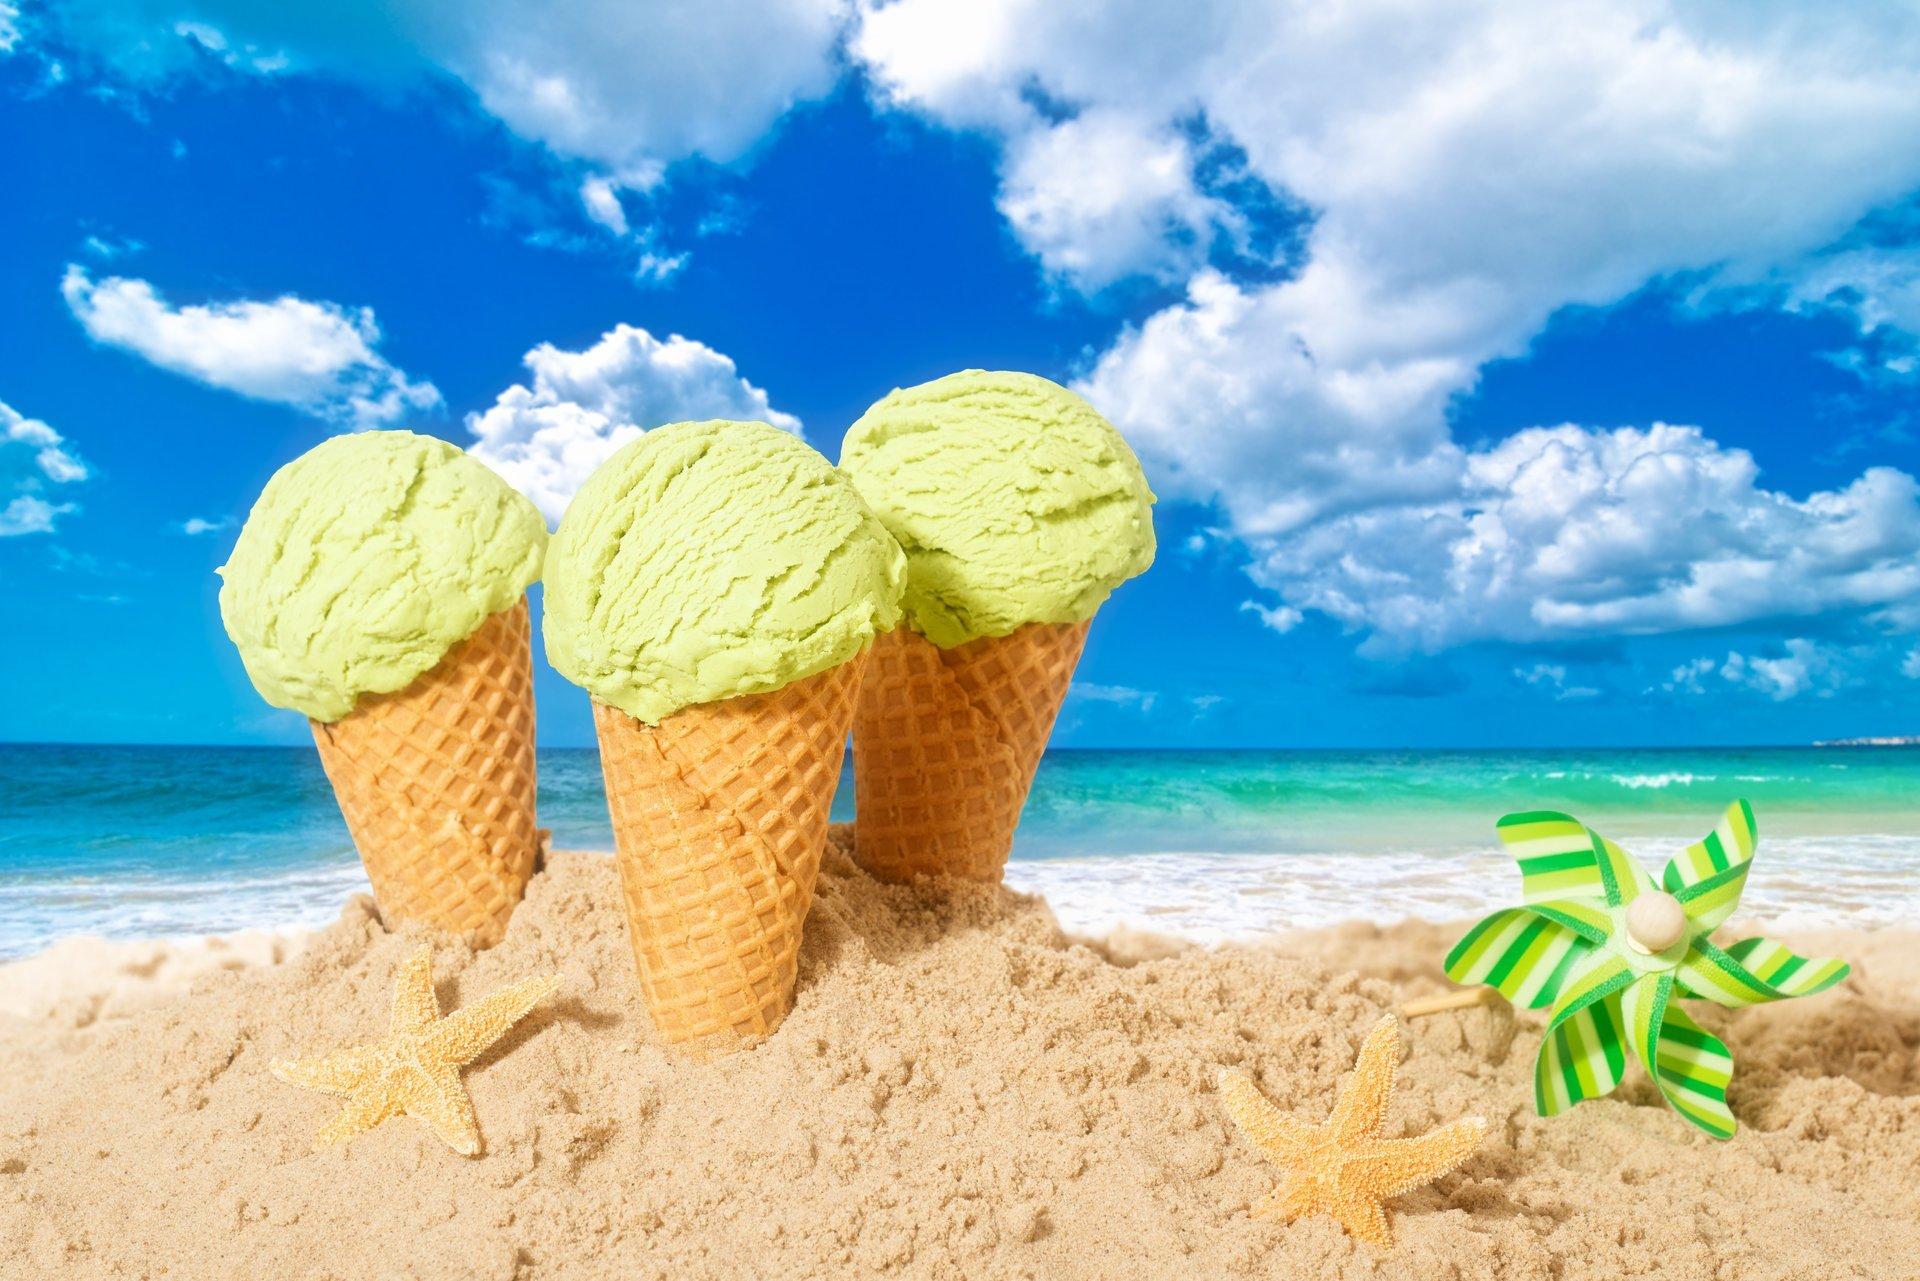 ice-cream-beach-sand-summer-sea-dessert-ice-cream-beach-sand-horn-summer